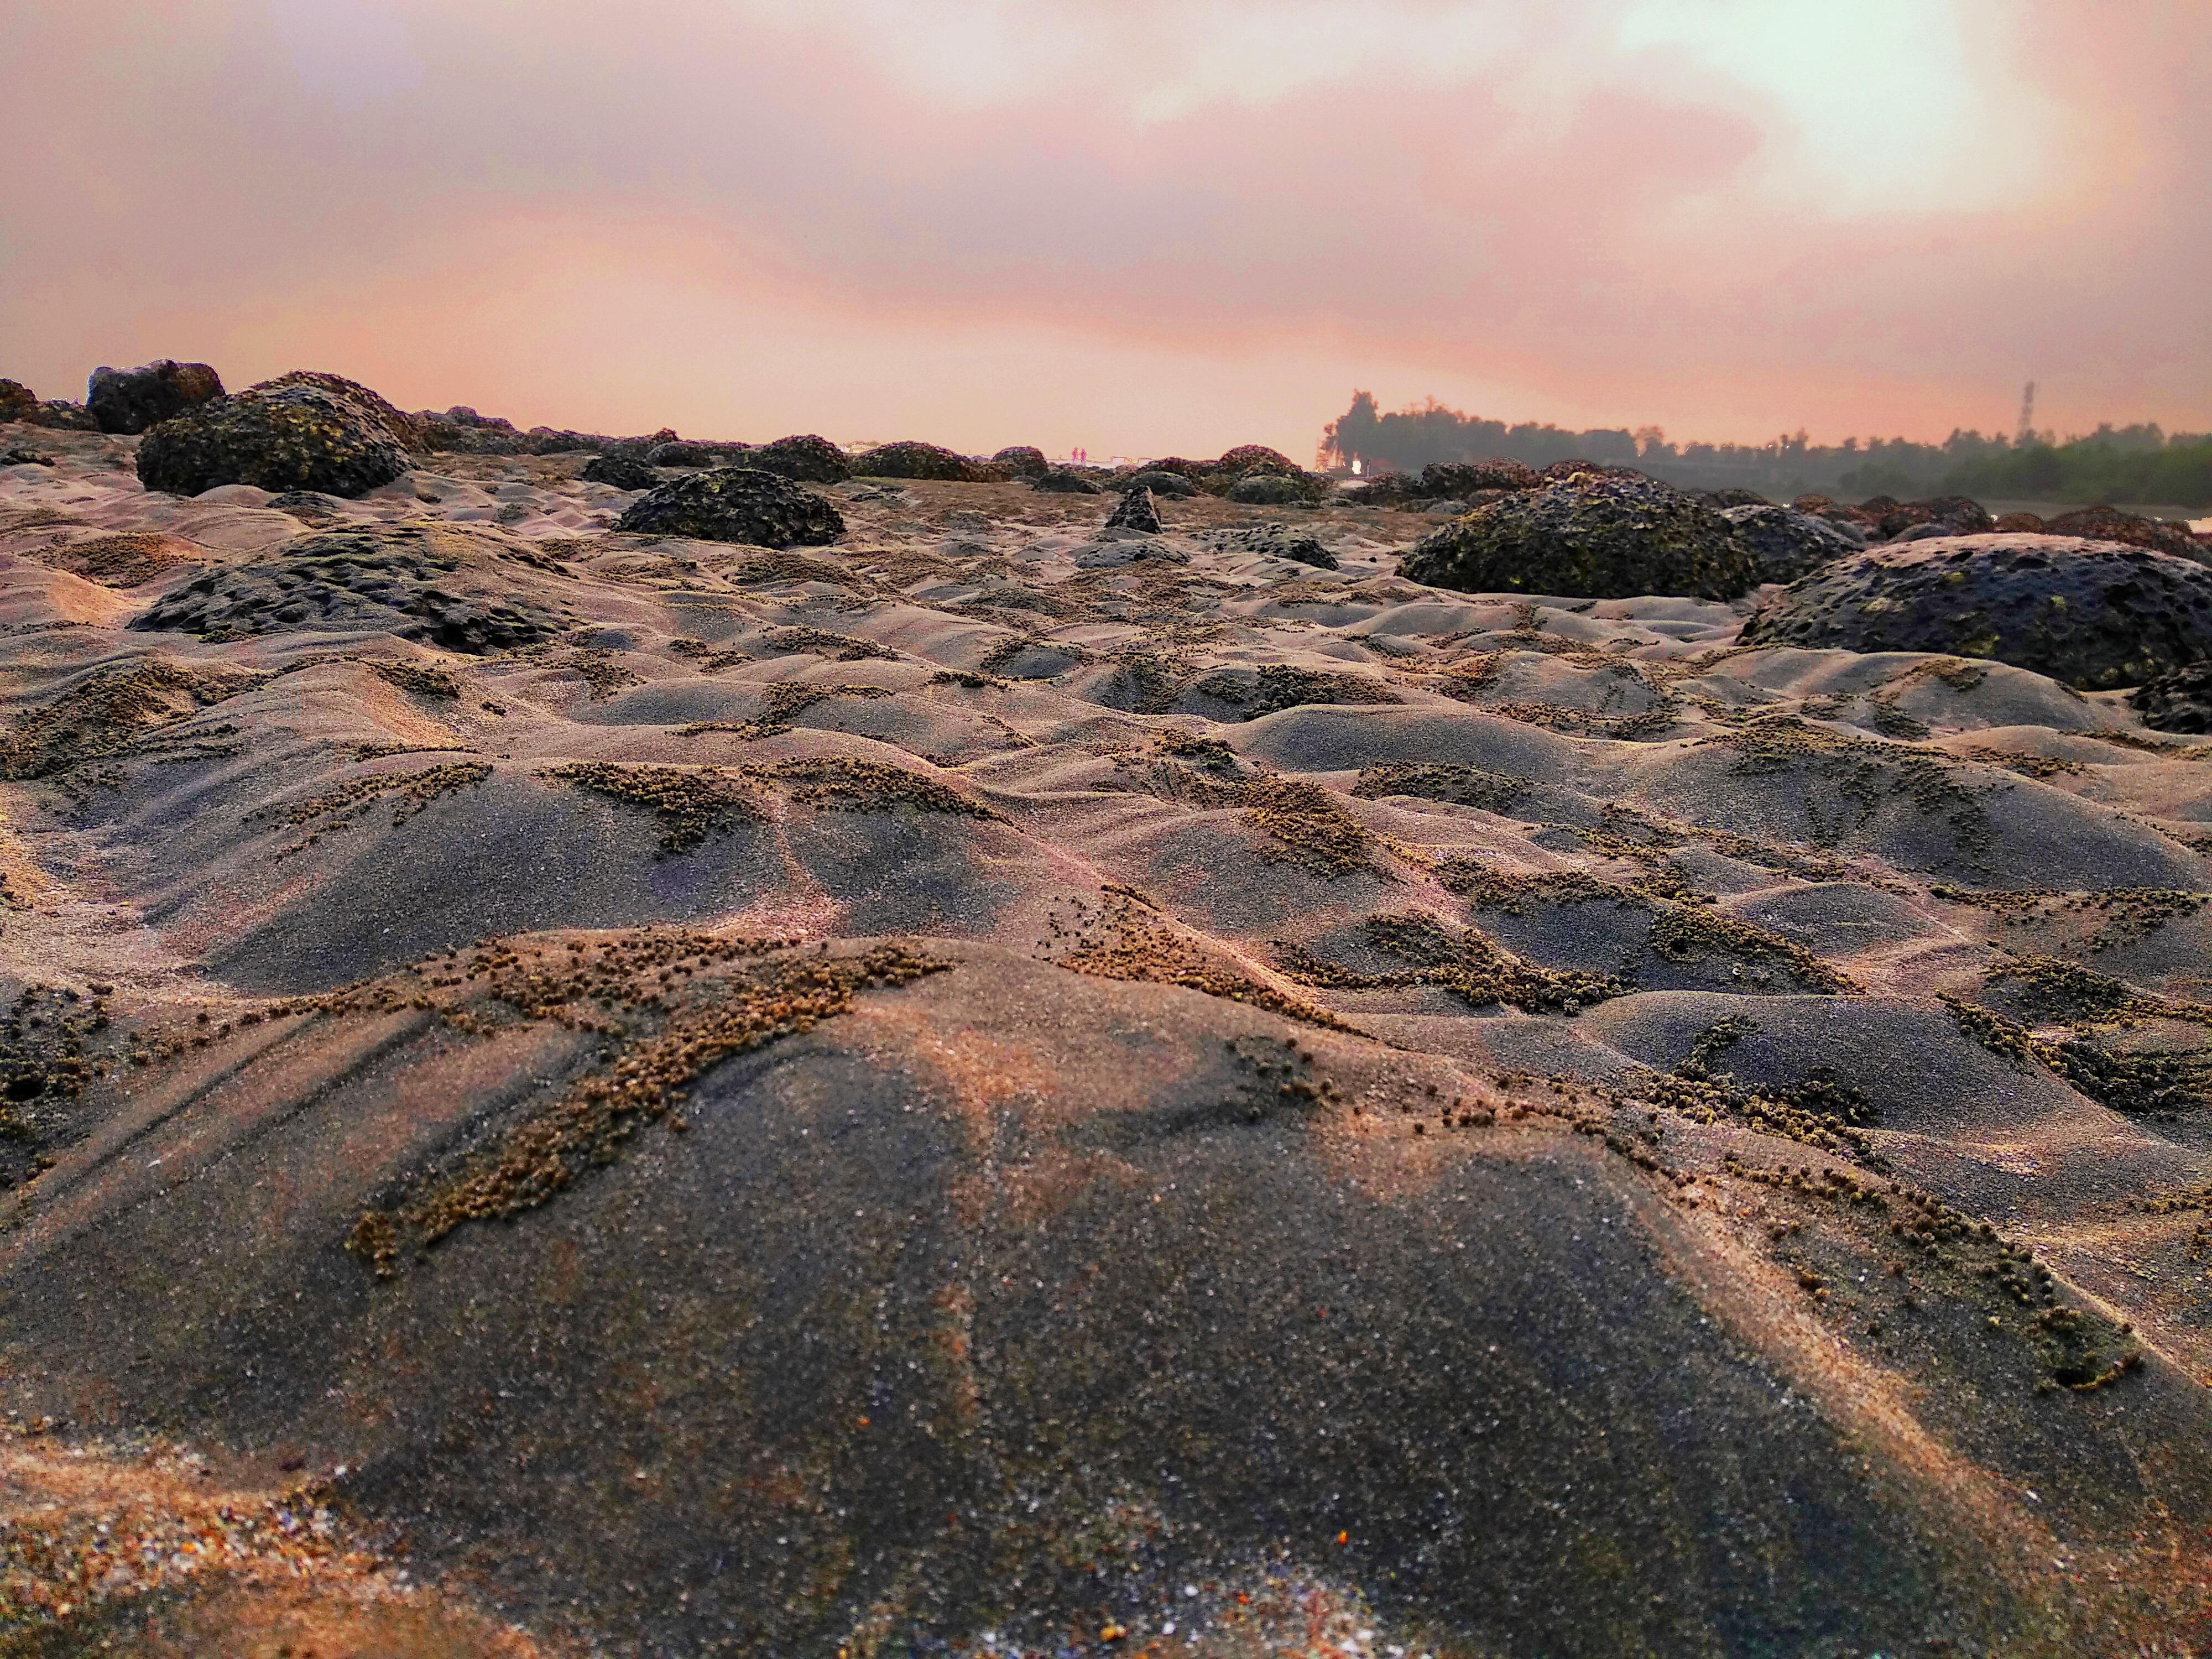 Crab holes on sea beach of saint martin's island at sunrise photo